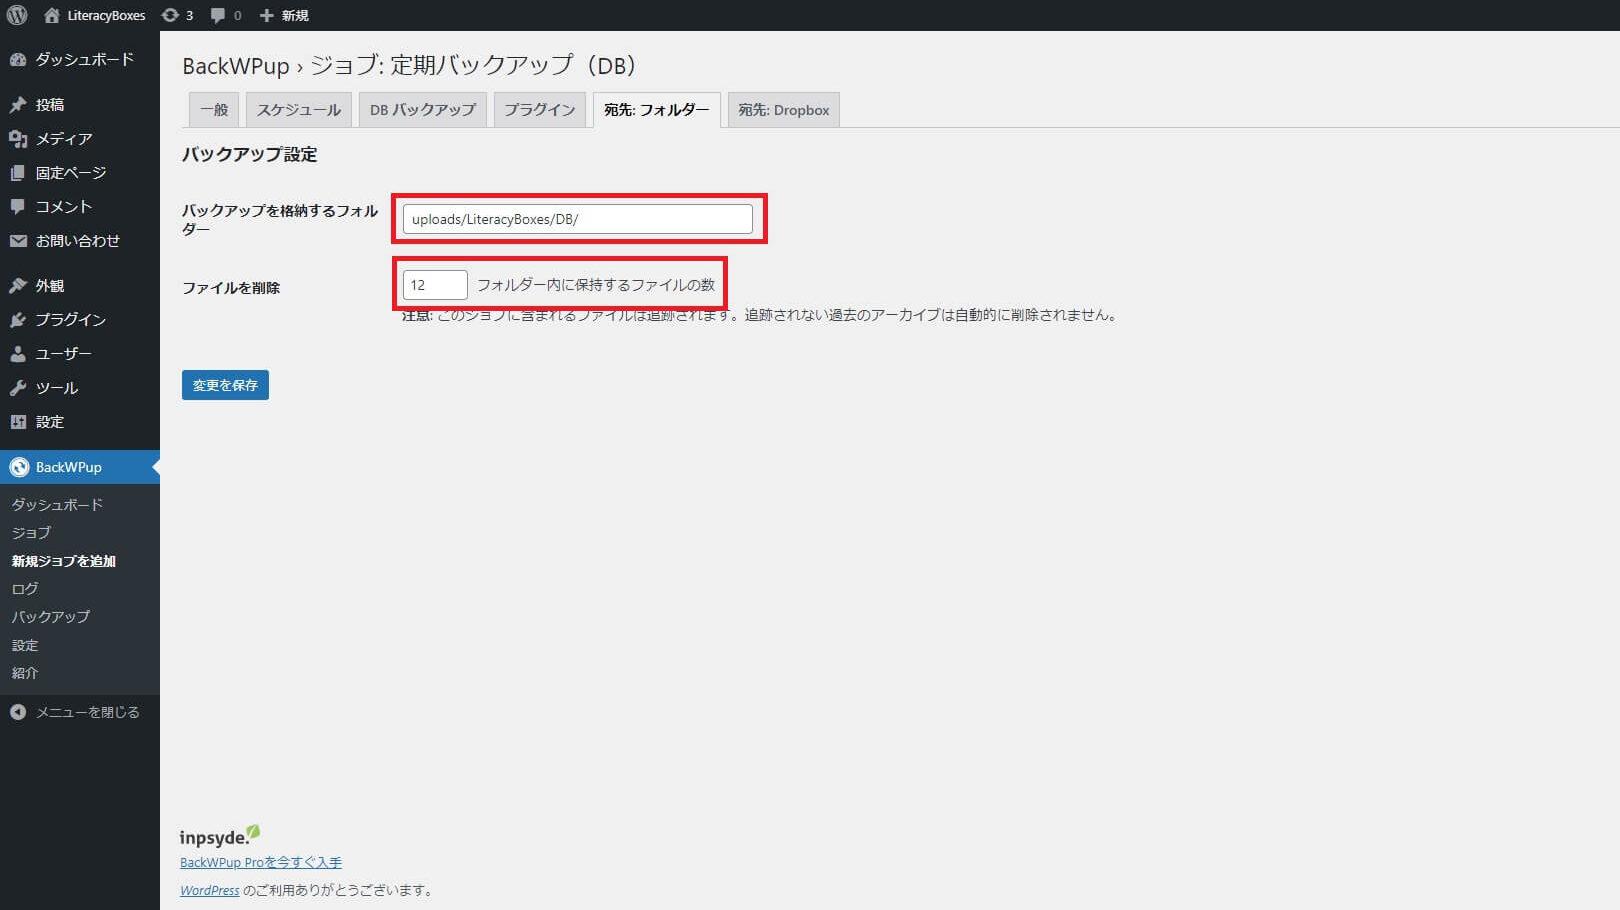 BackWPupジョブ新規追加 - 宛先:フォルダー(DB)